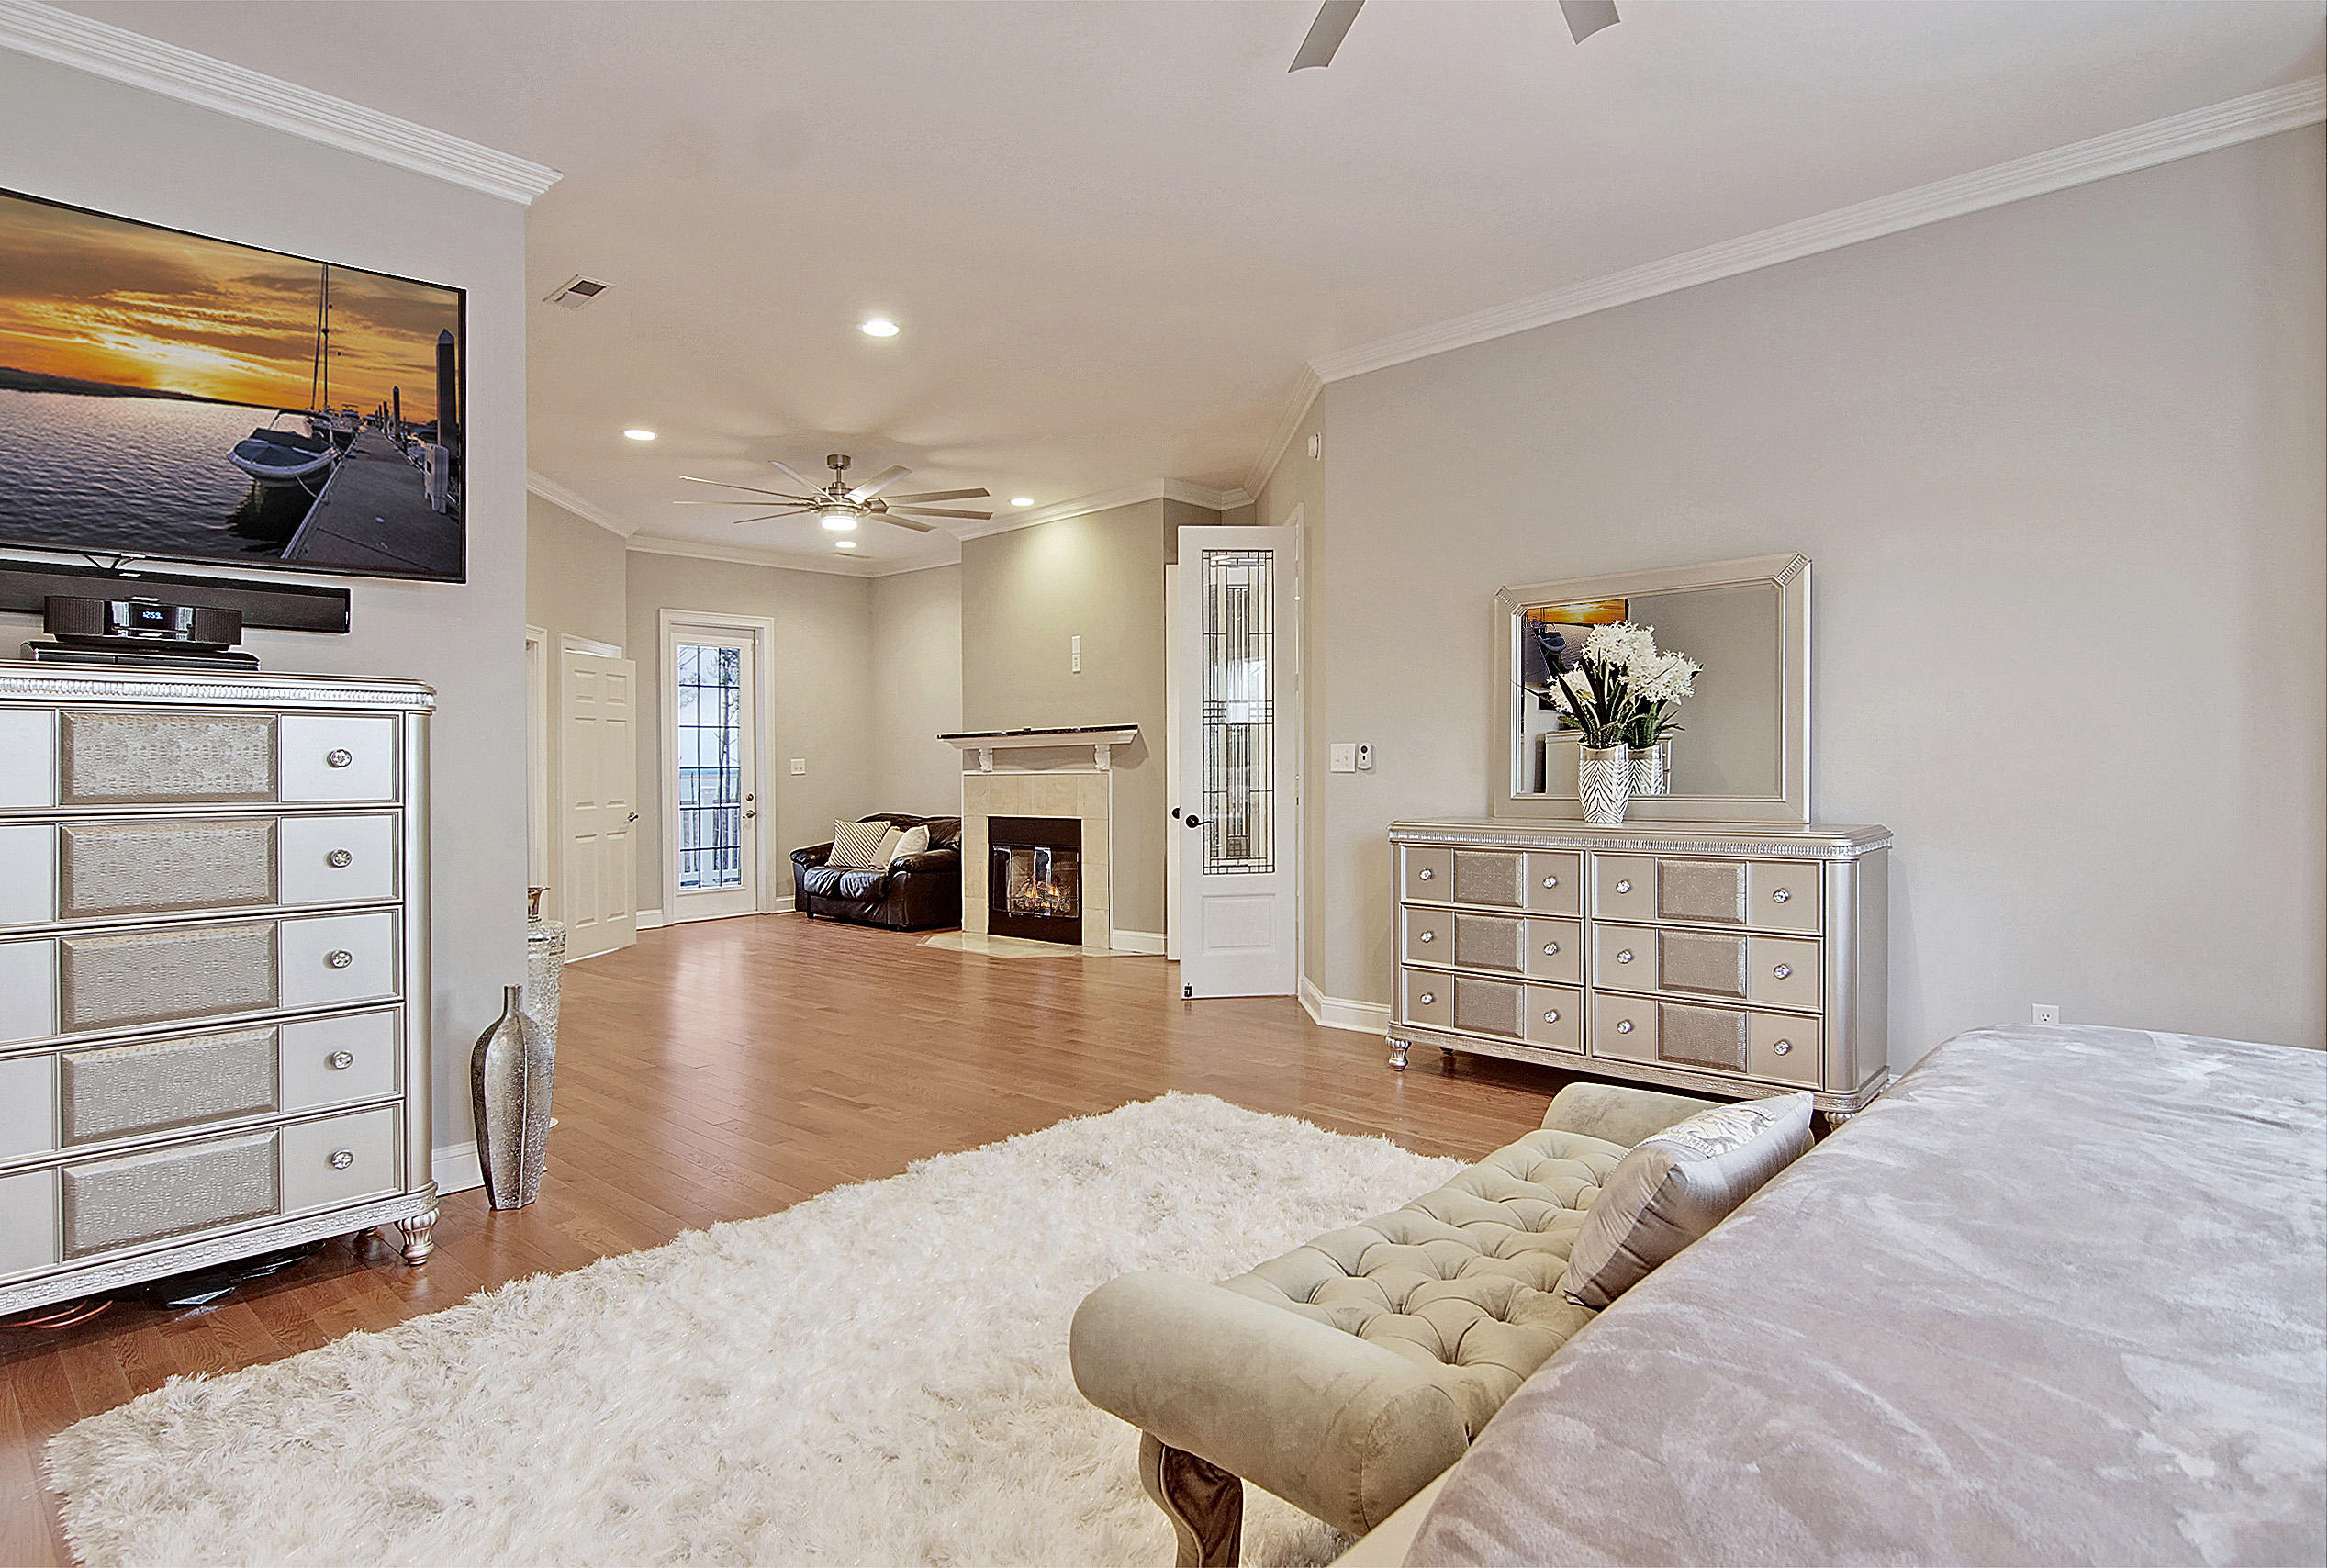 Hamlin Beach Homes For Sale - 2797 Hamlin Beach, Mount Pleasant, SC - 58